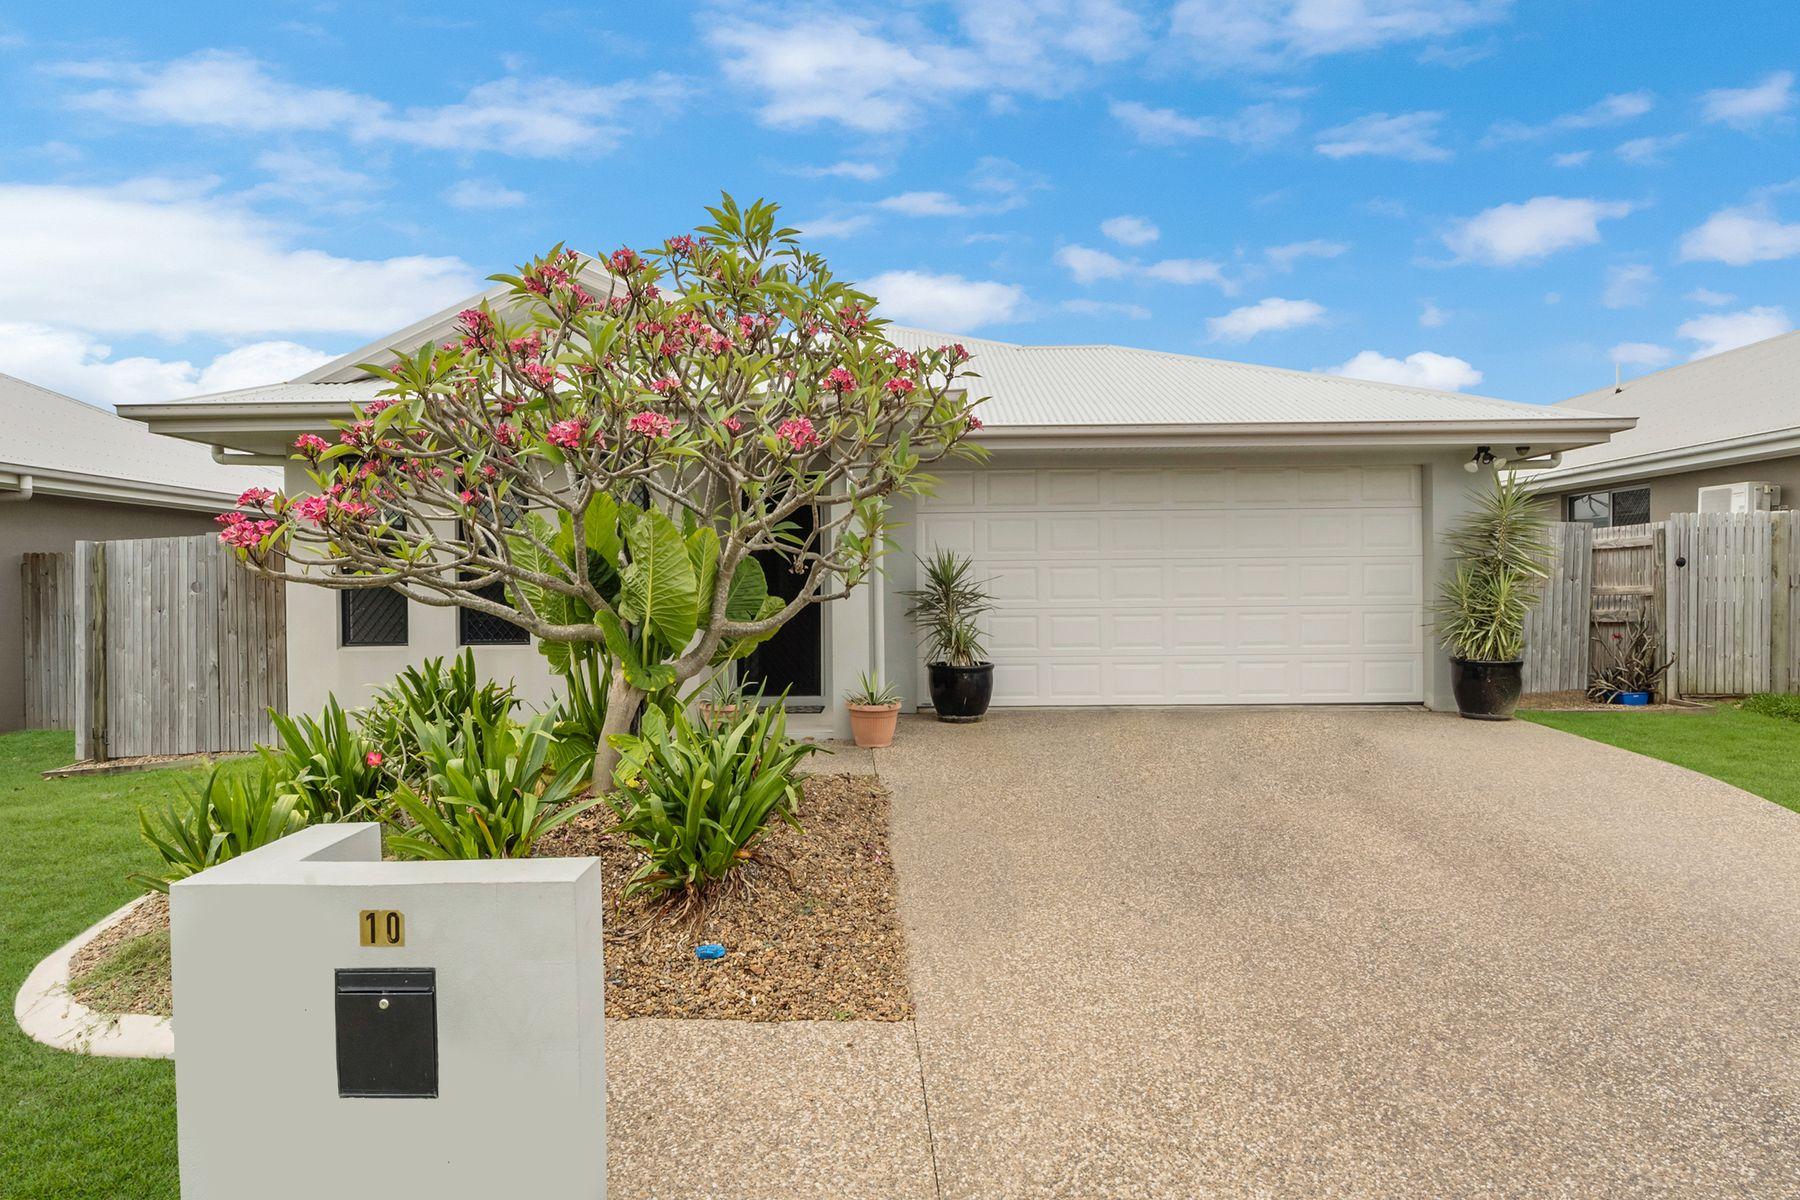 10 Tooma Lane, Kelso, QLD 4815